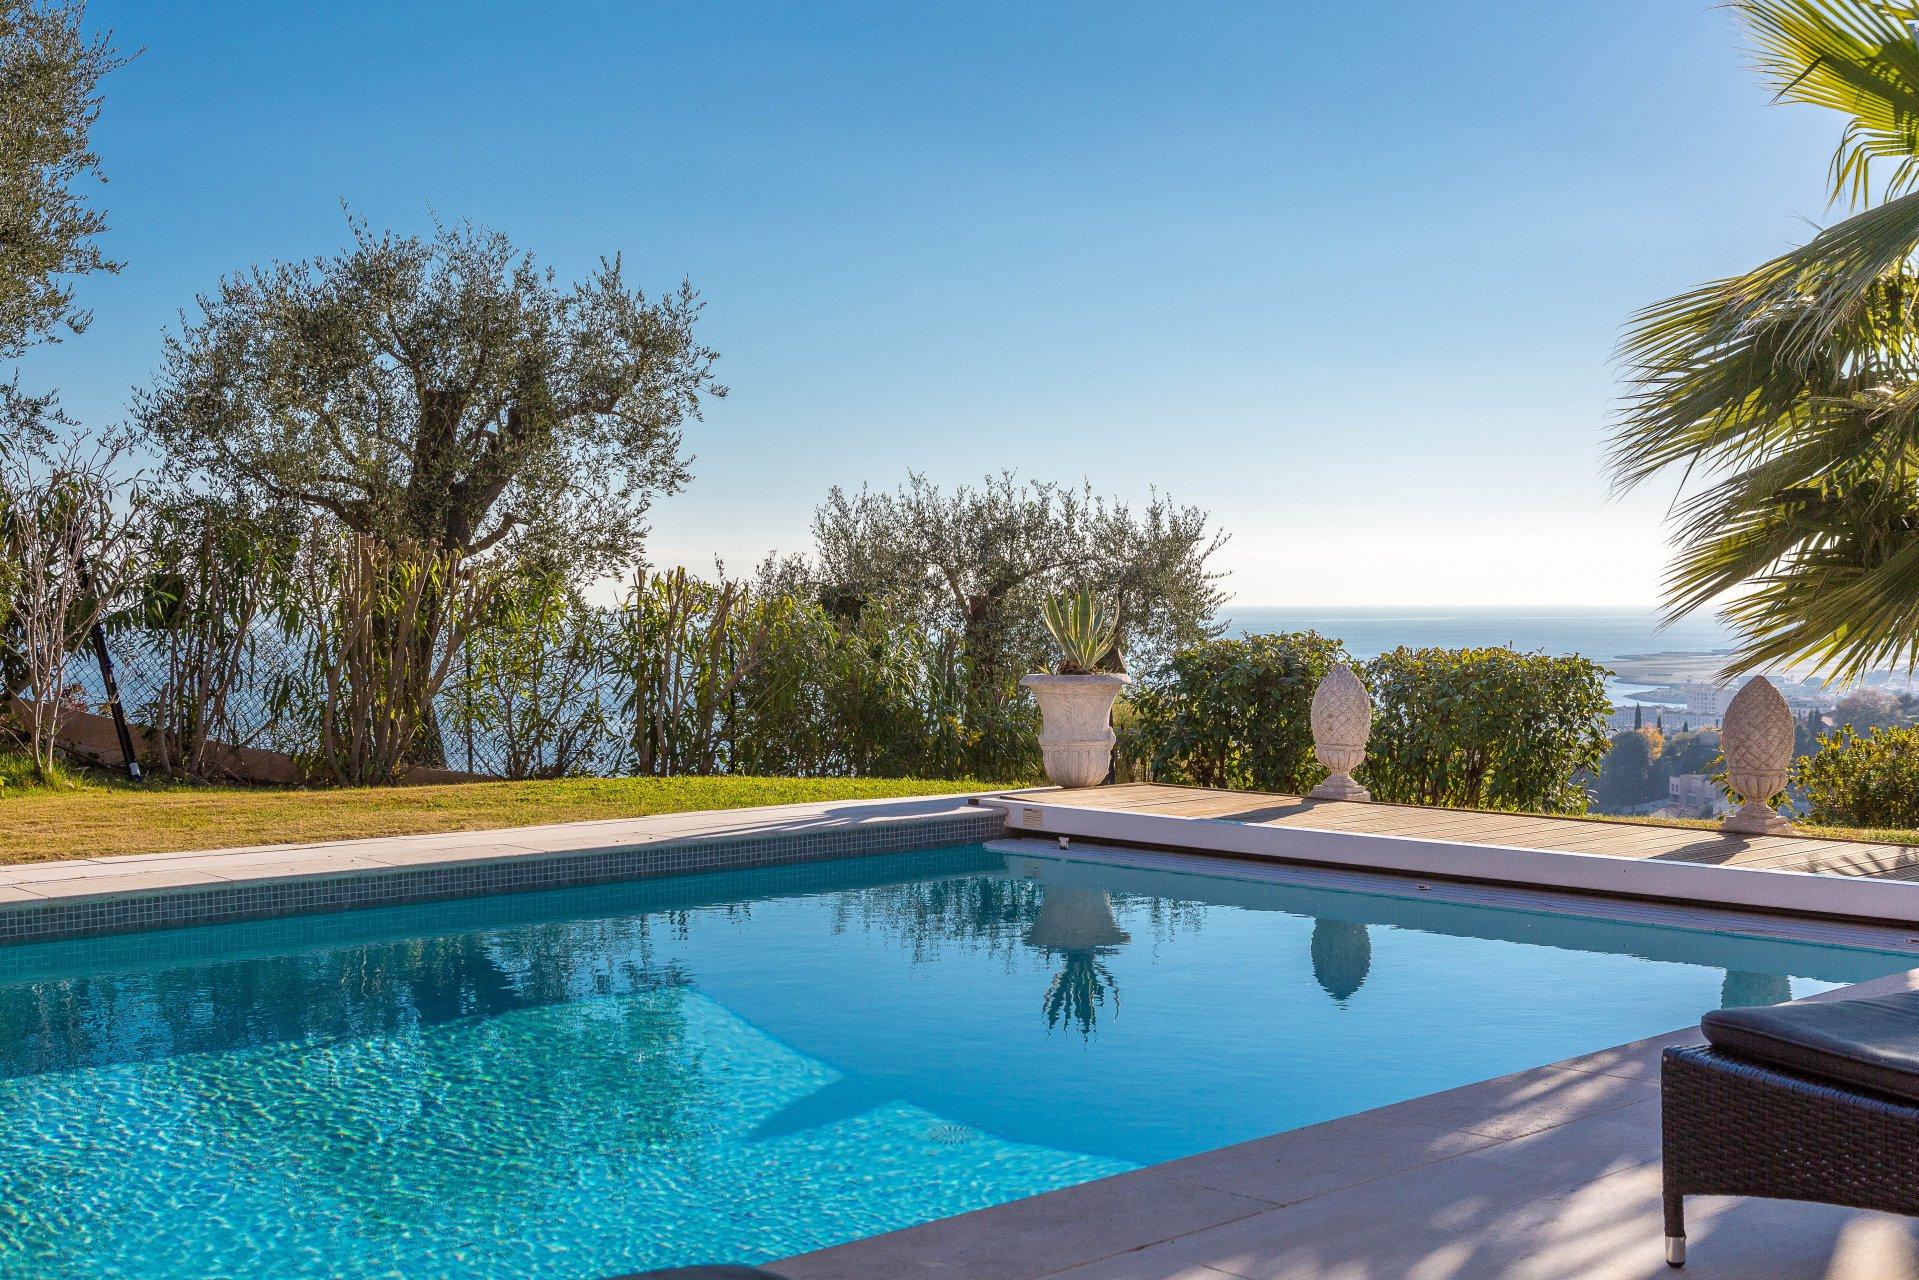 Nice - Magnan - Belle Villa 5 Chambres Avec Vue Mer ... serapportantà Piscine Magnan Nice